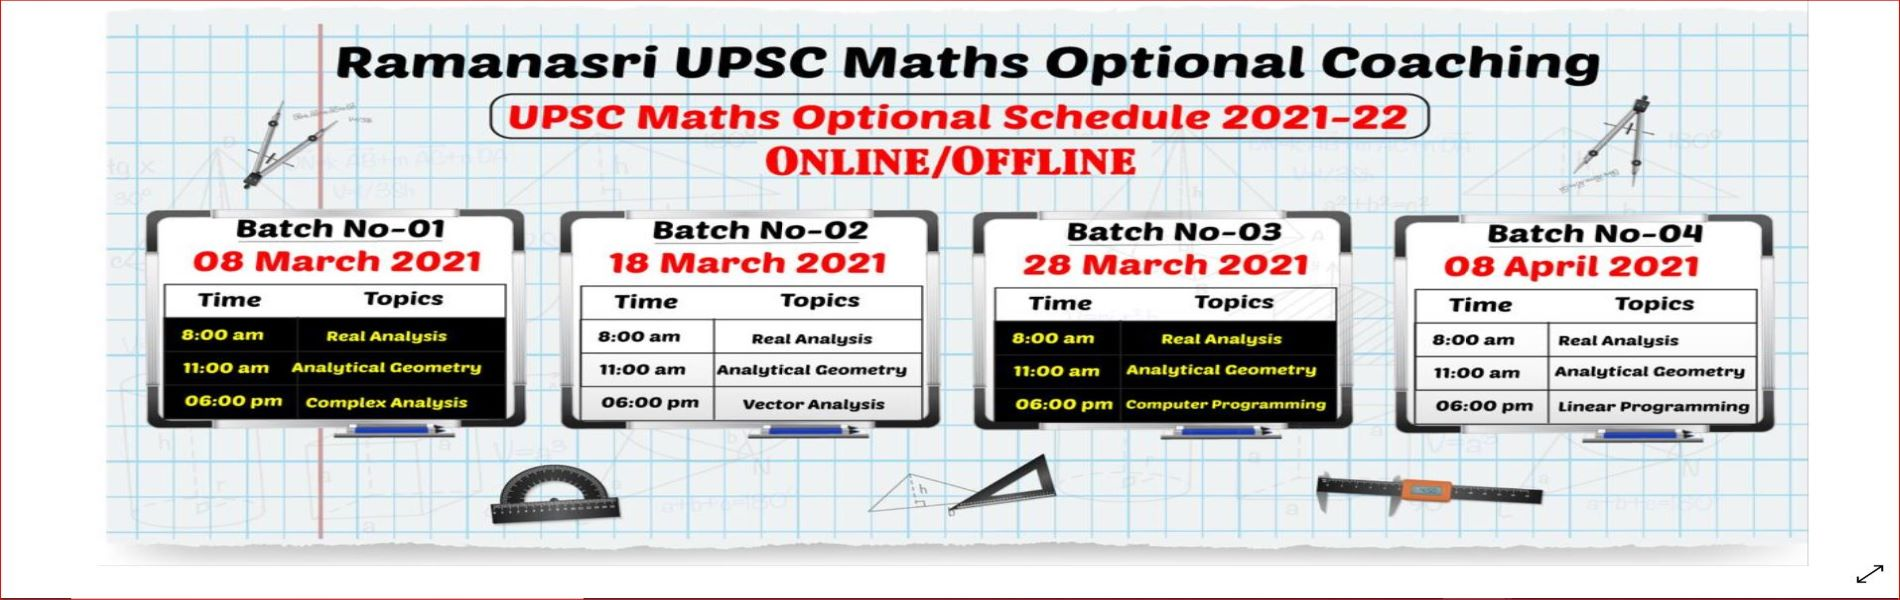 Ramanasri UPSC Maths Optional Coaching